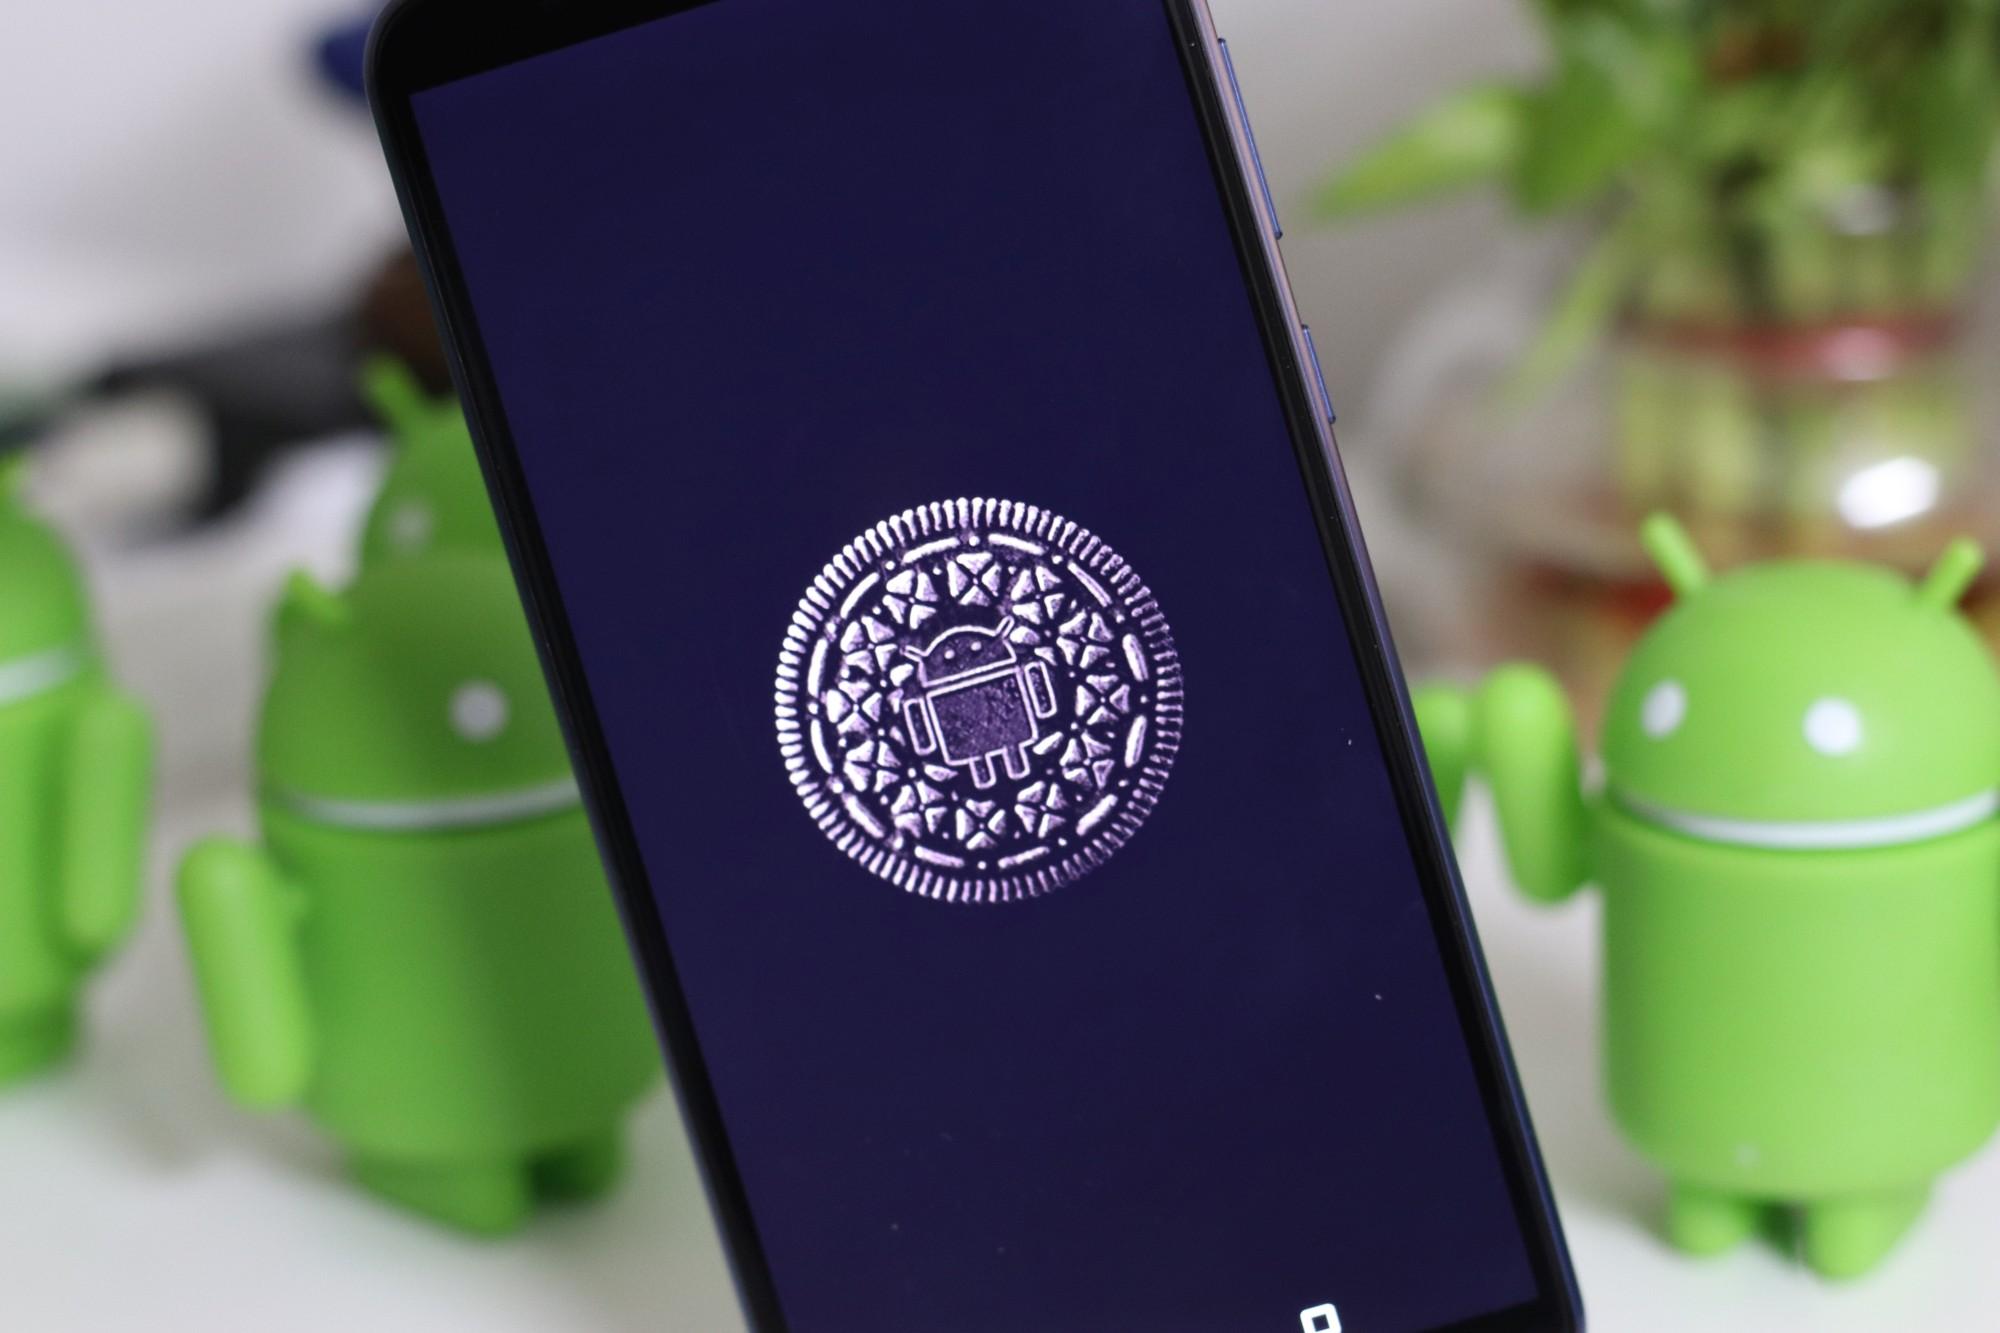 Honor 7X Oreo release news